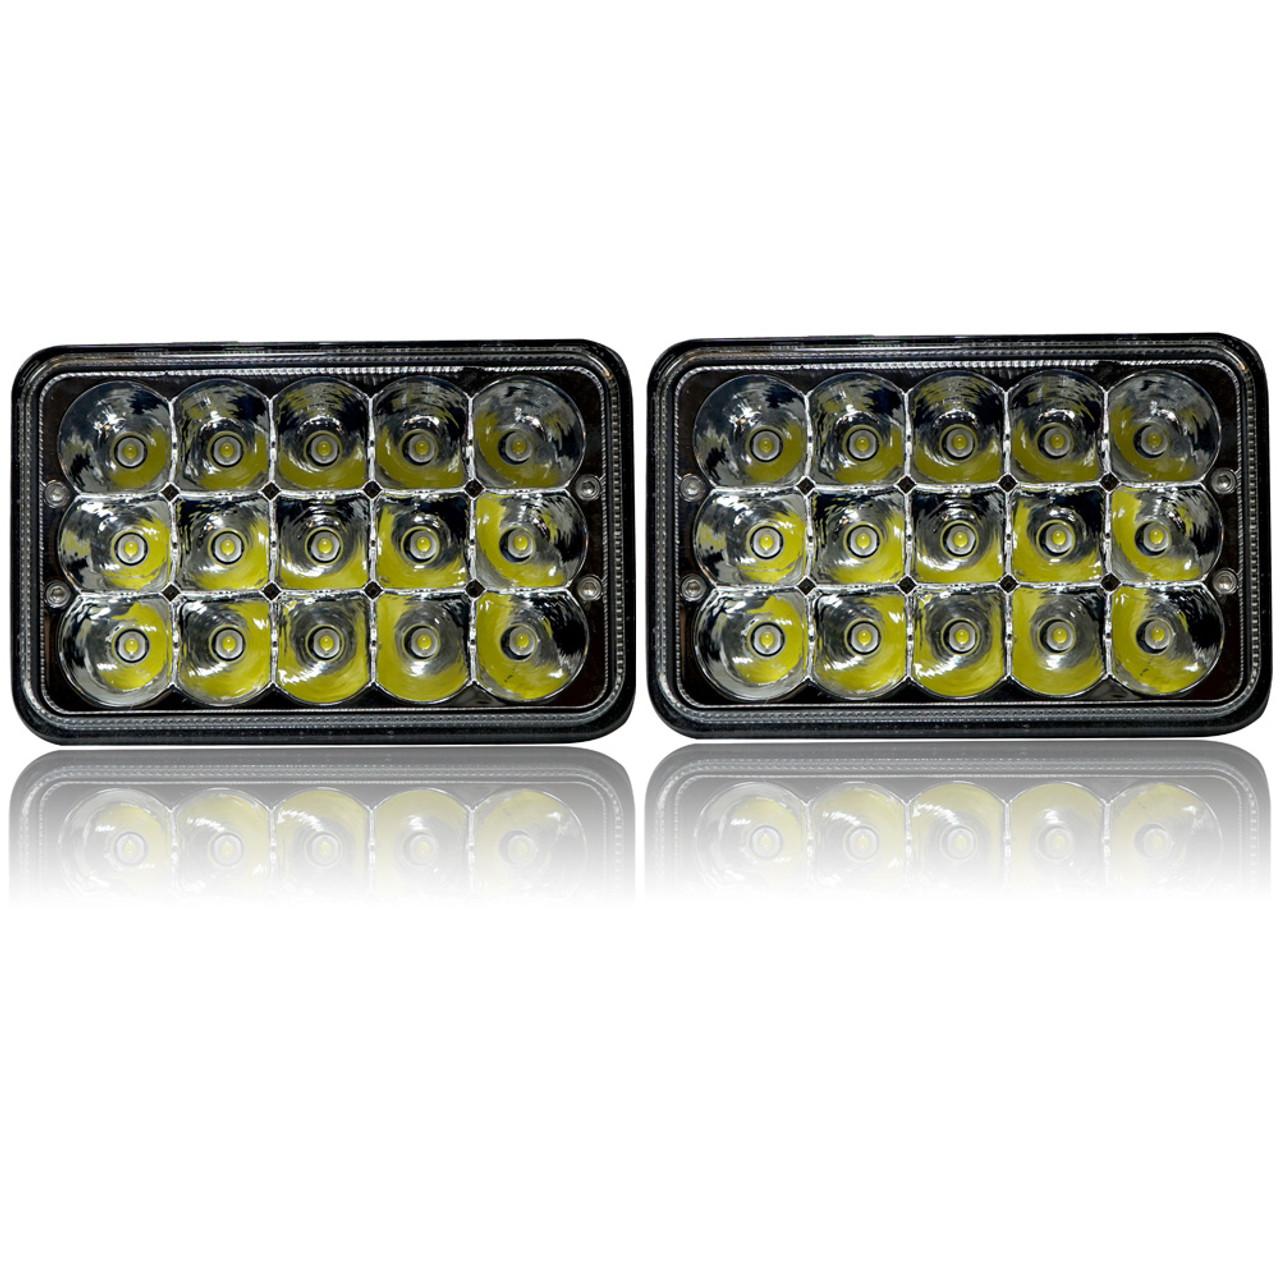 4x6 led array headlights h4651 h4652 h4656 h4666 h6545 chrome set [ 1001 x 1001 Pixel ]